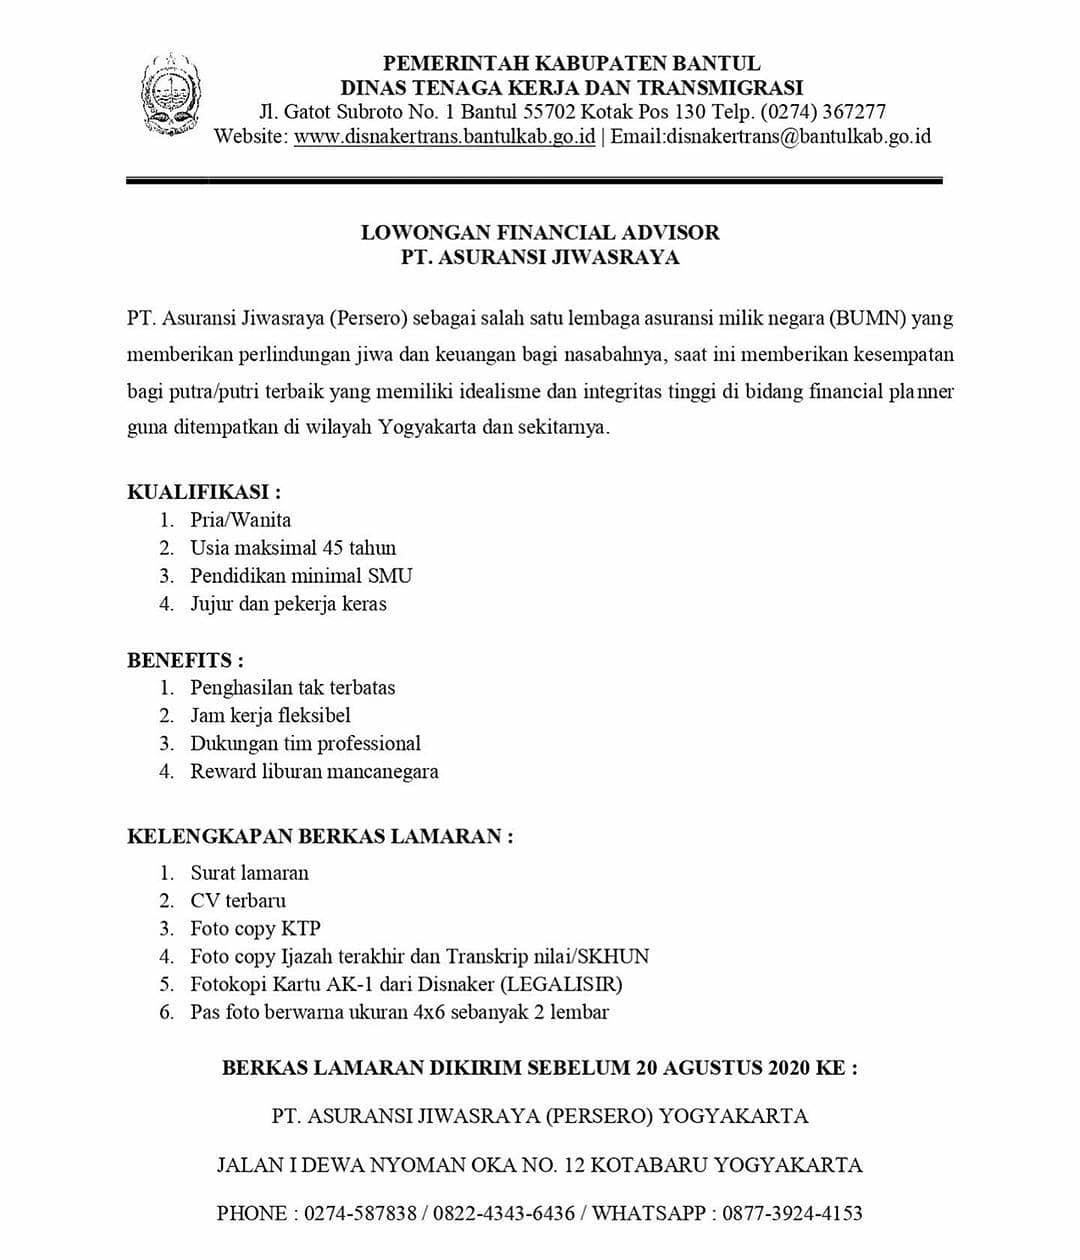 Lowongan Kerja SMA PT Asuransi Jiwasraya (Persero) Tahun 2020